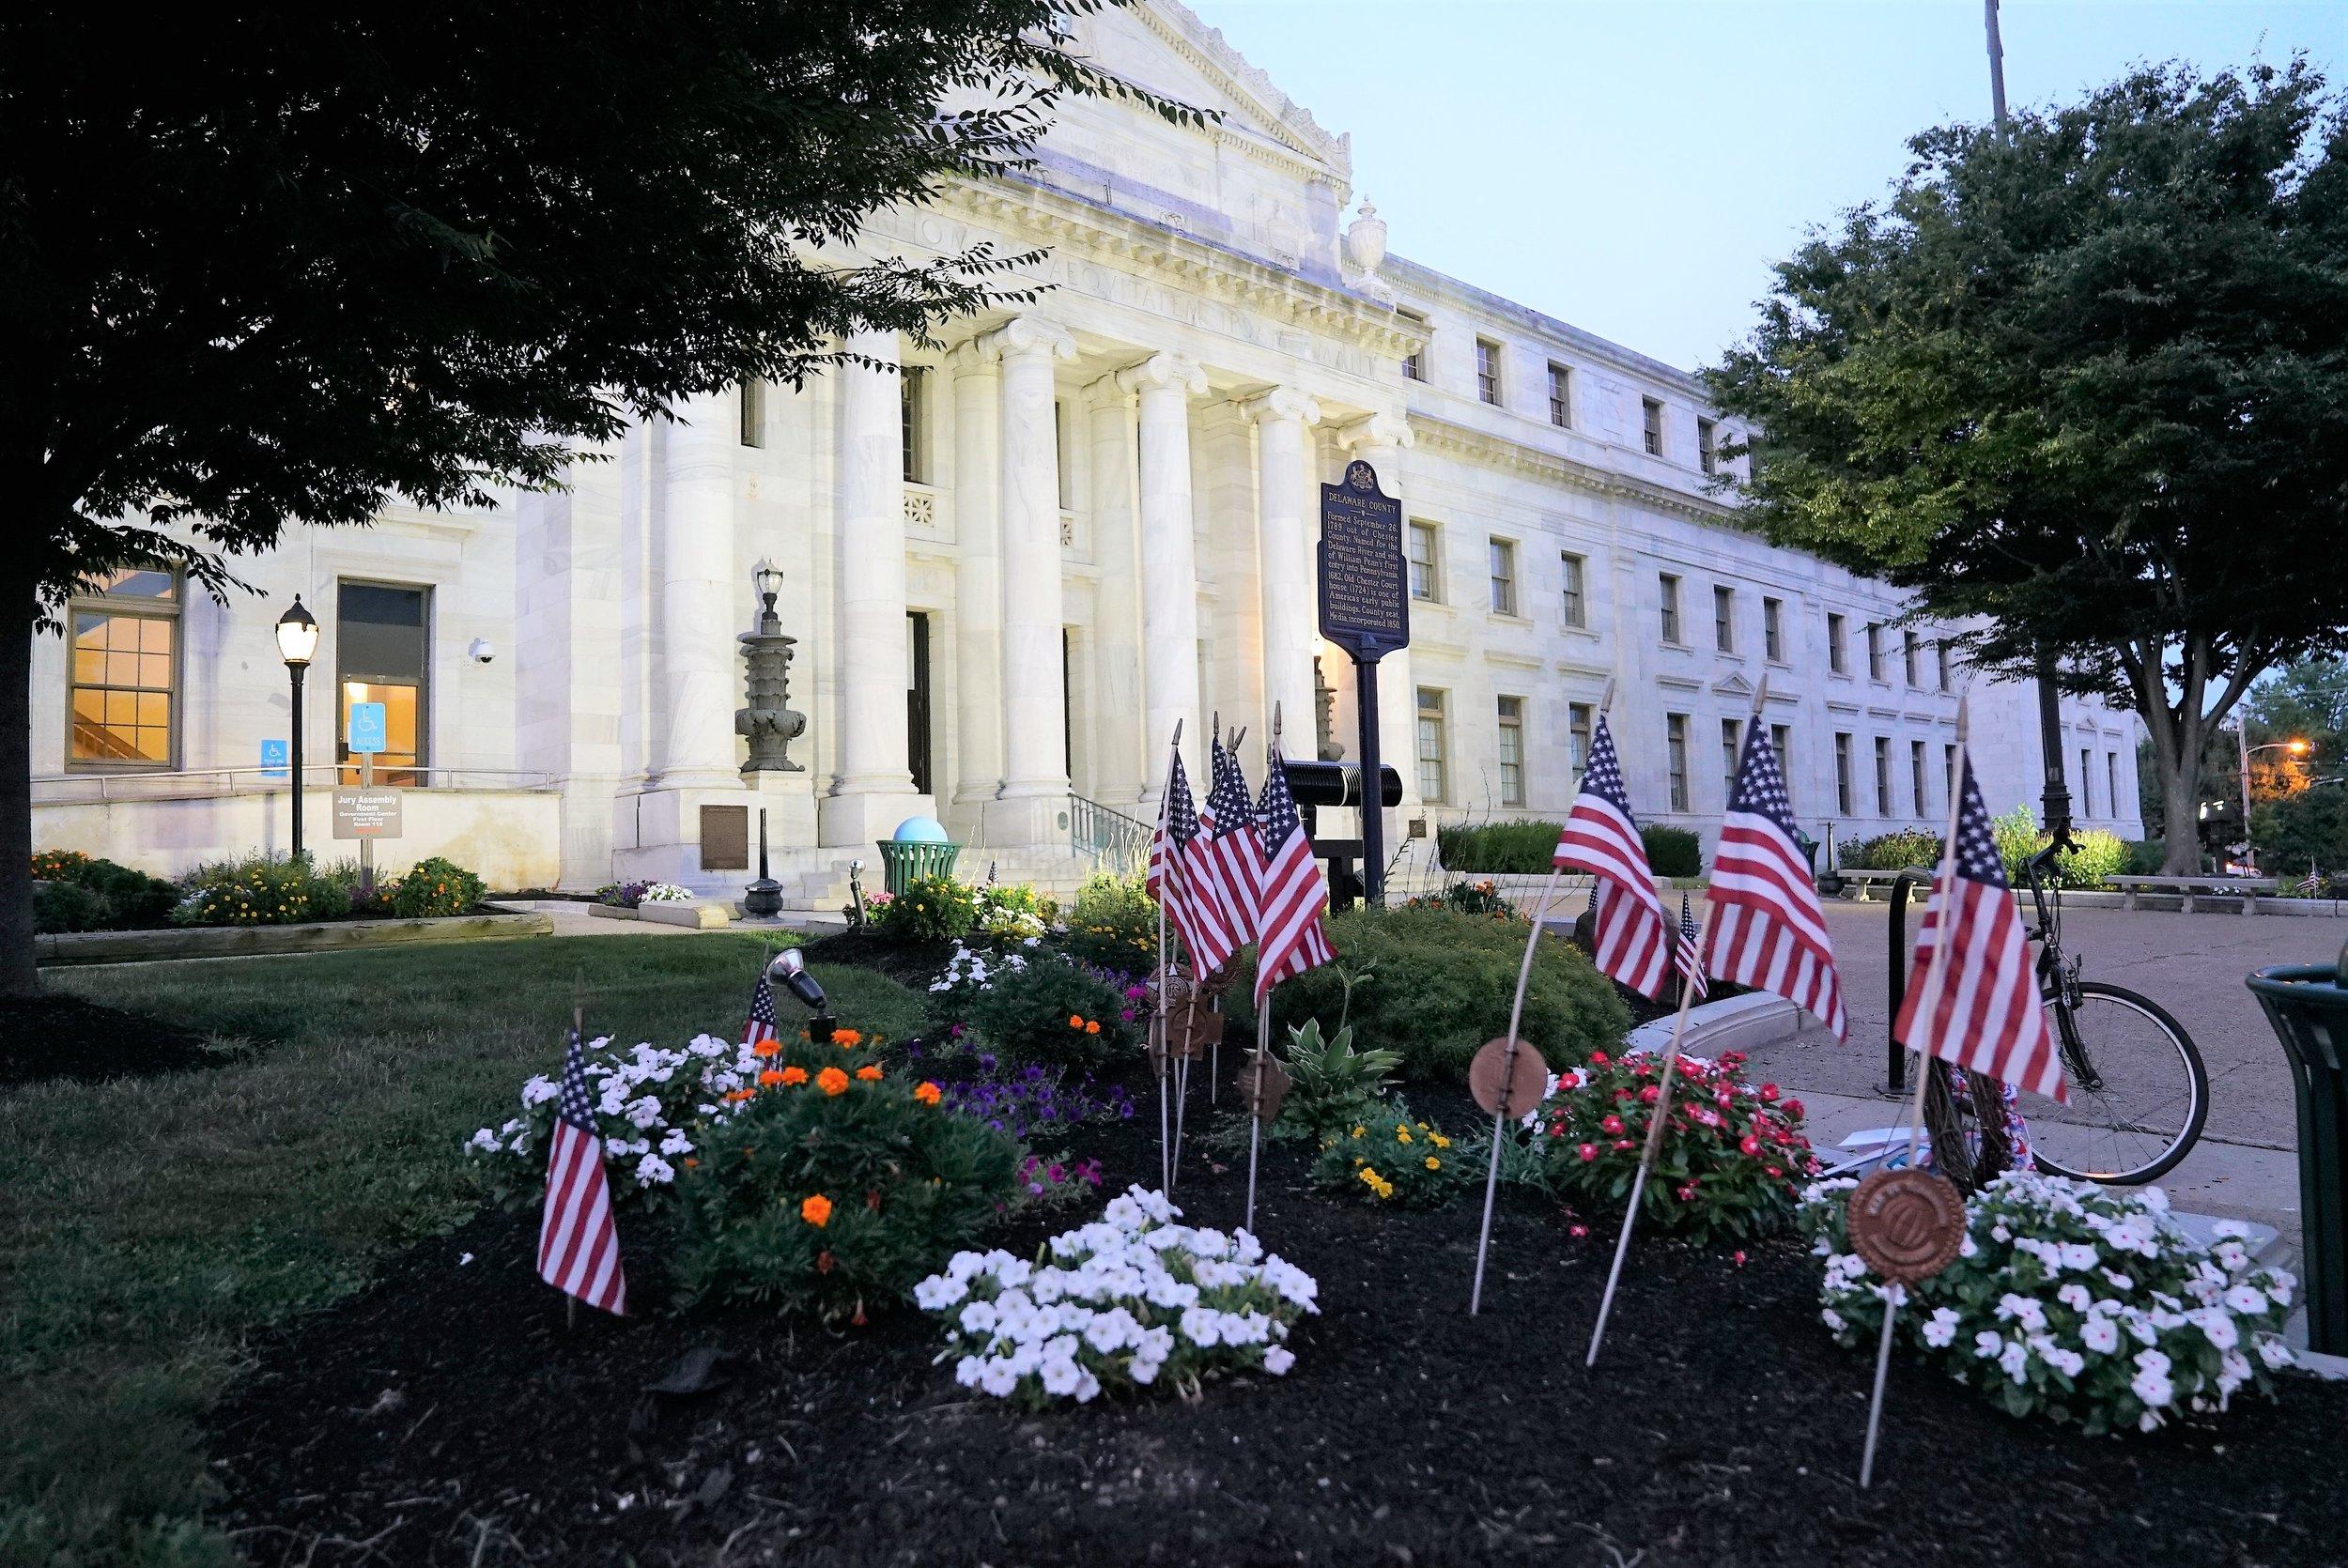 Photo: Entrance to Delaware County Courthouse. Media, Pennsylvania.